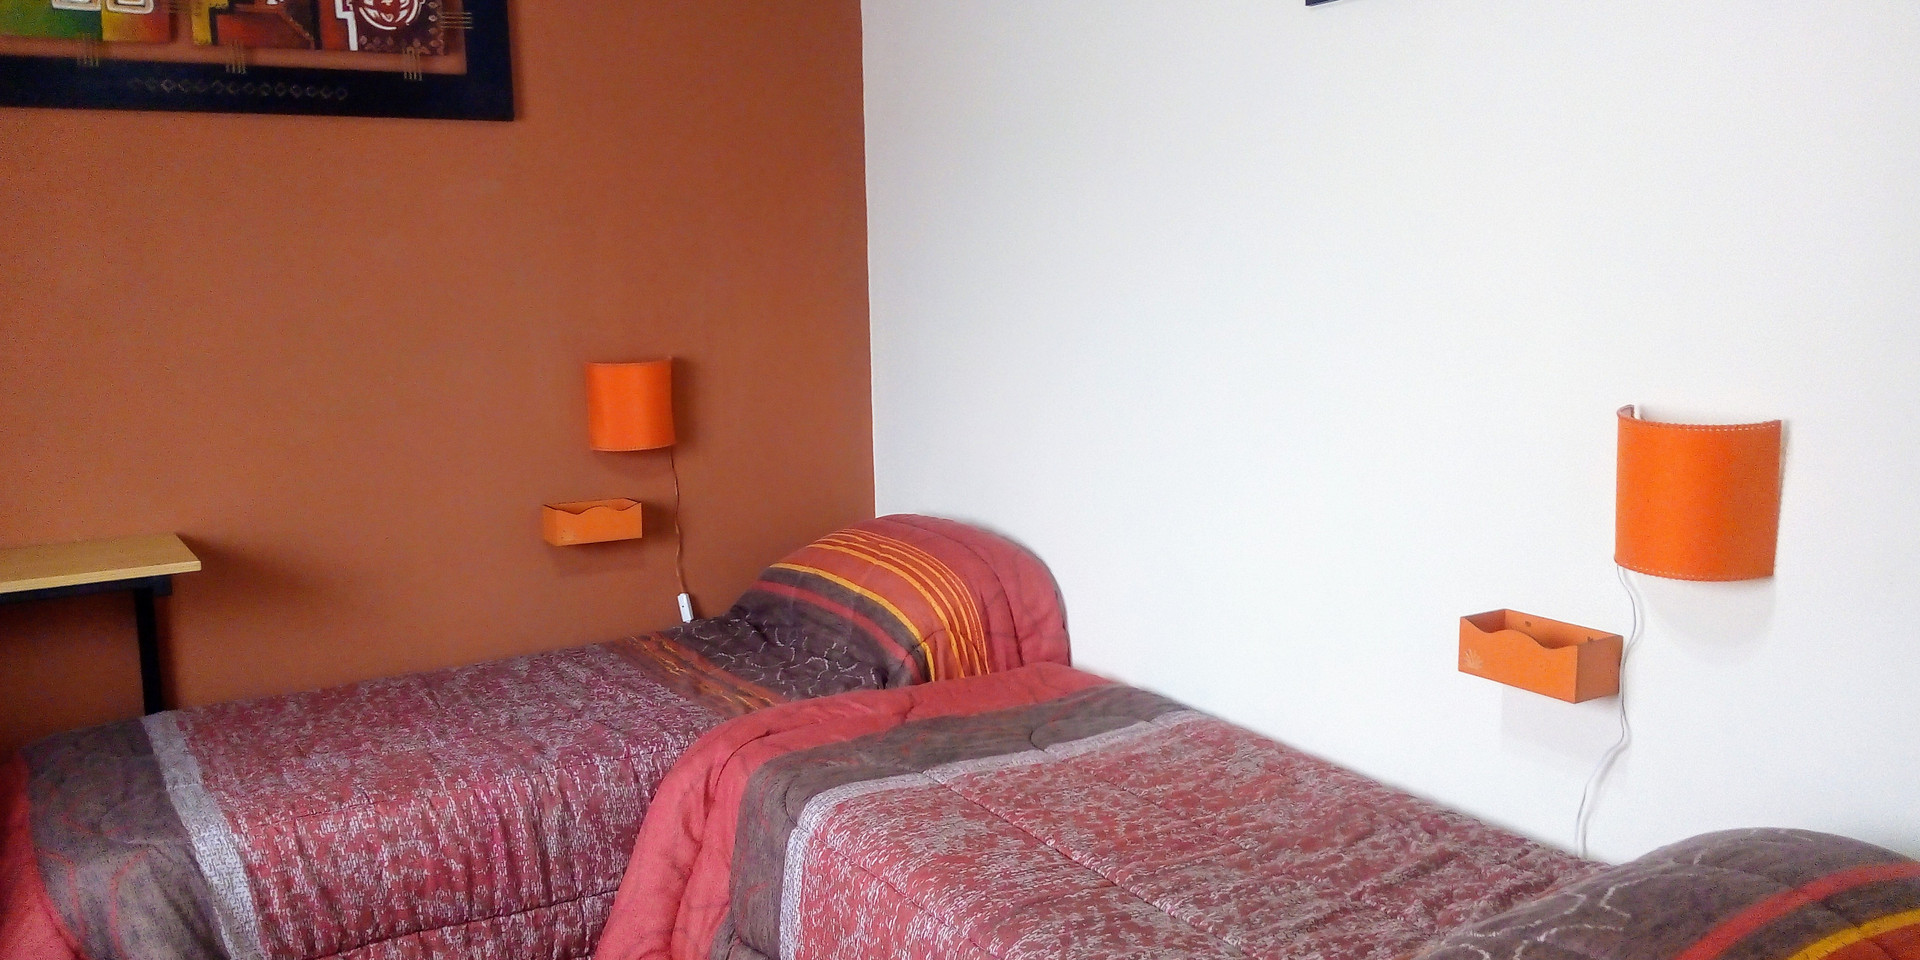 Dormitorio triple o cuádruple